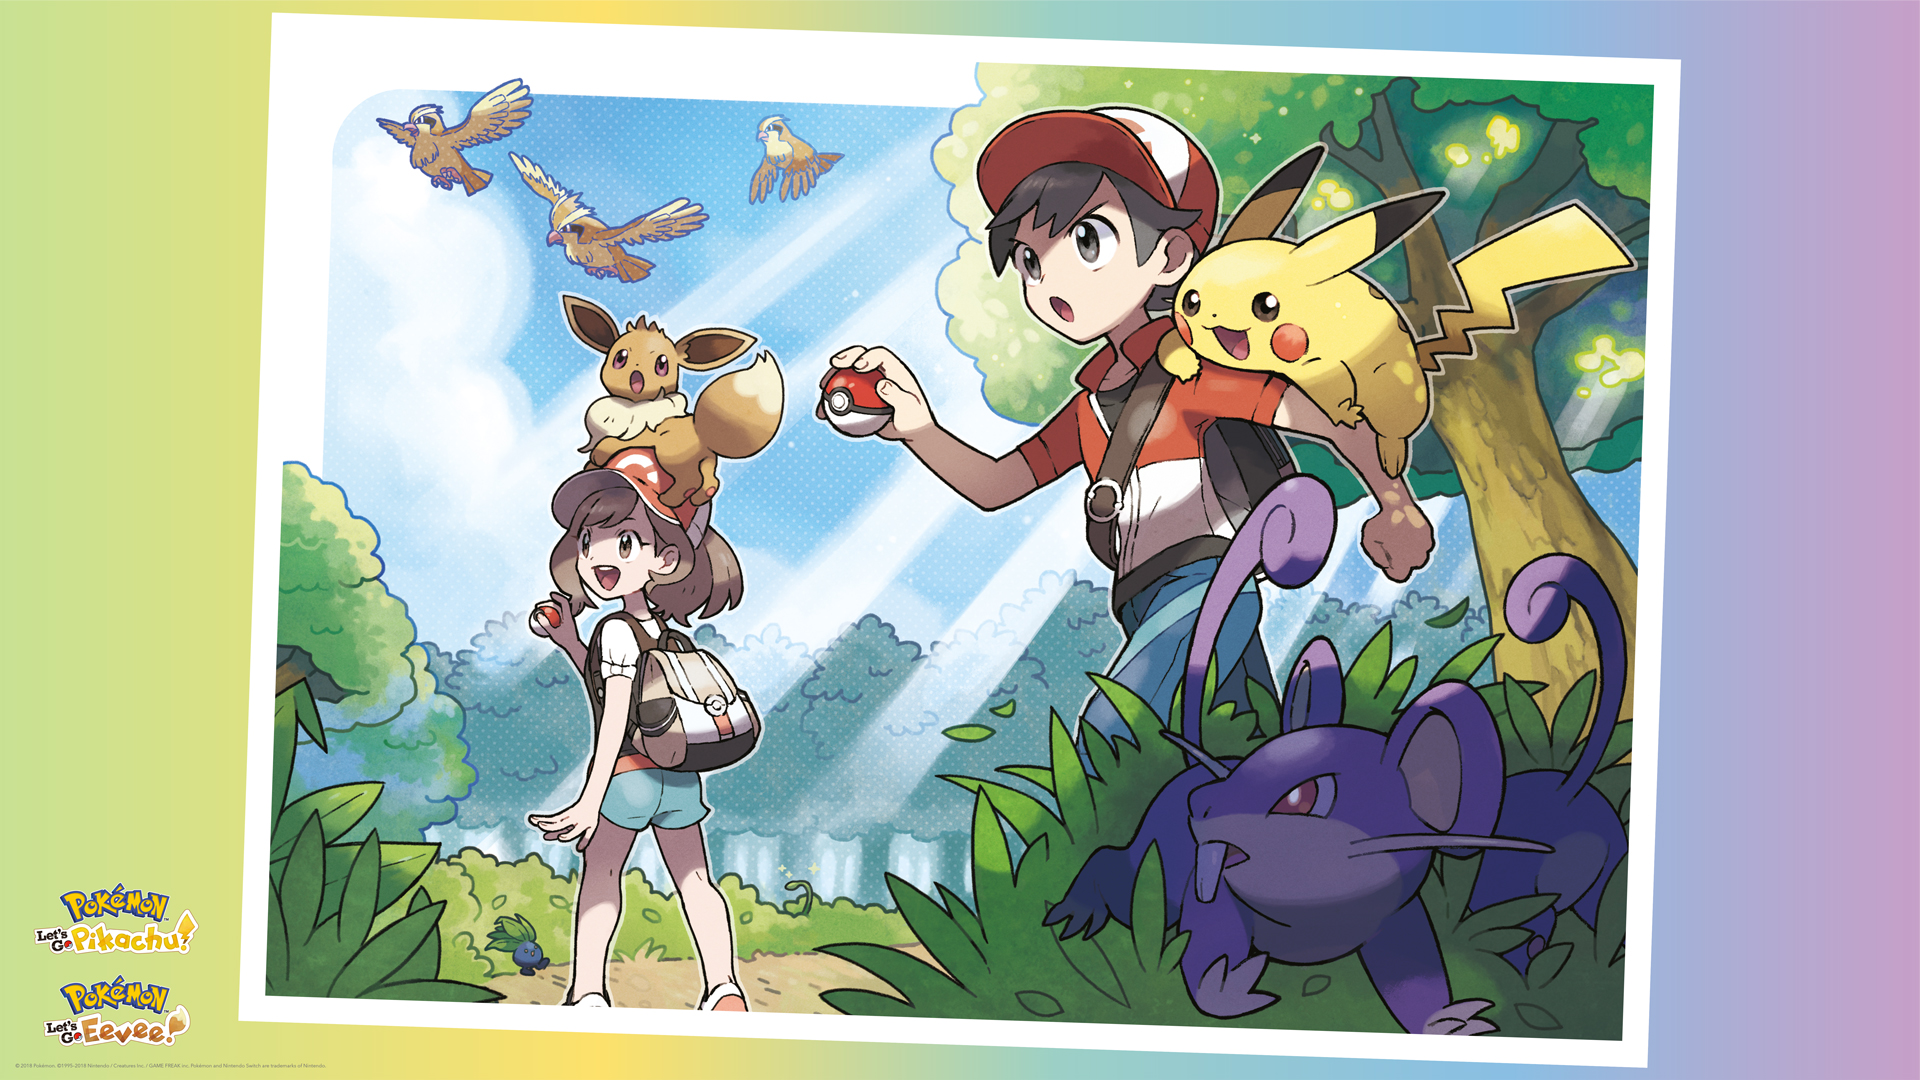 sconto di 20€ su Pokémon Let's Go